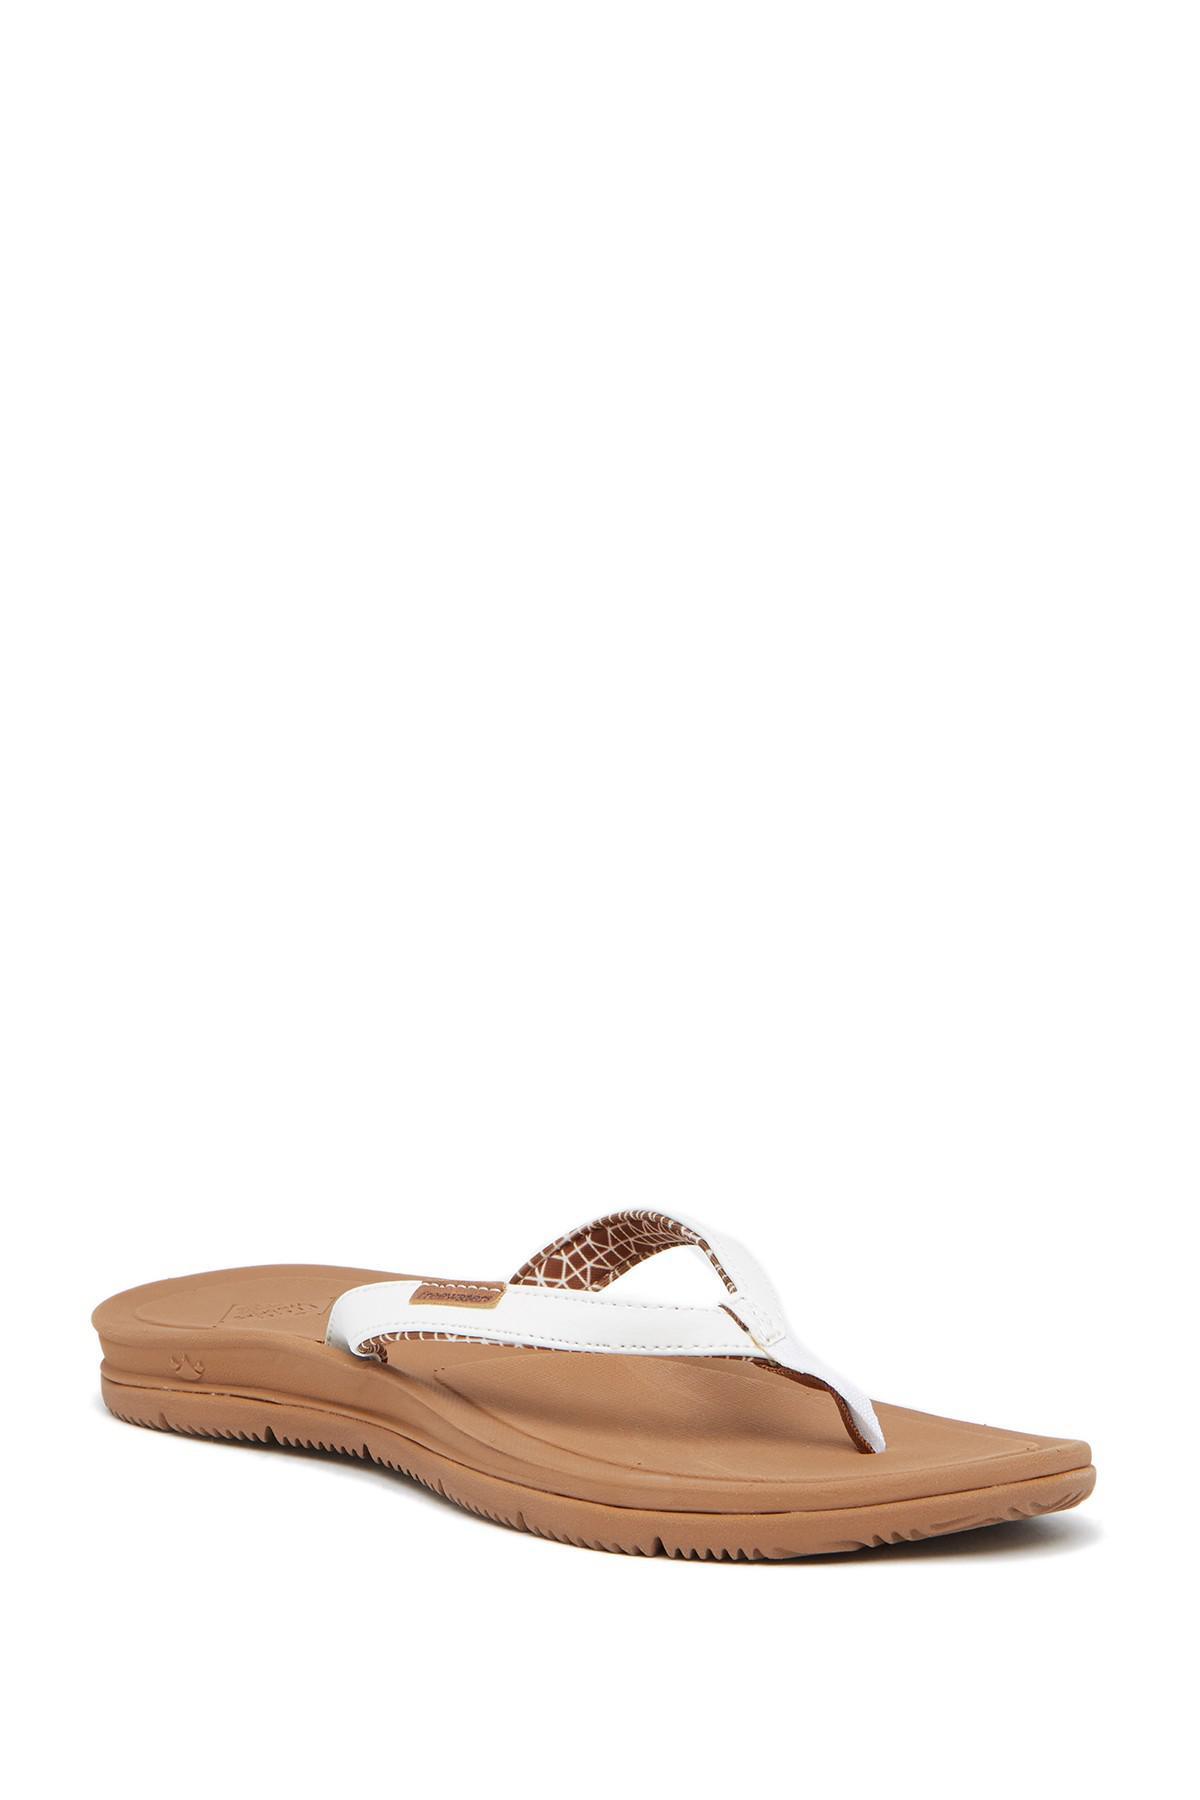 4ce90feb3628 Freewaters - Multicolor Tall Girl Flip Flop Sandal (women) - Lyst. View  fullscreen